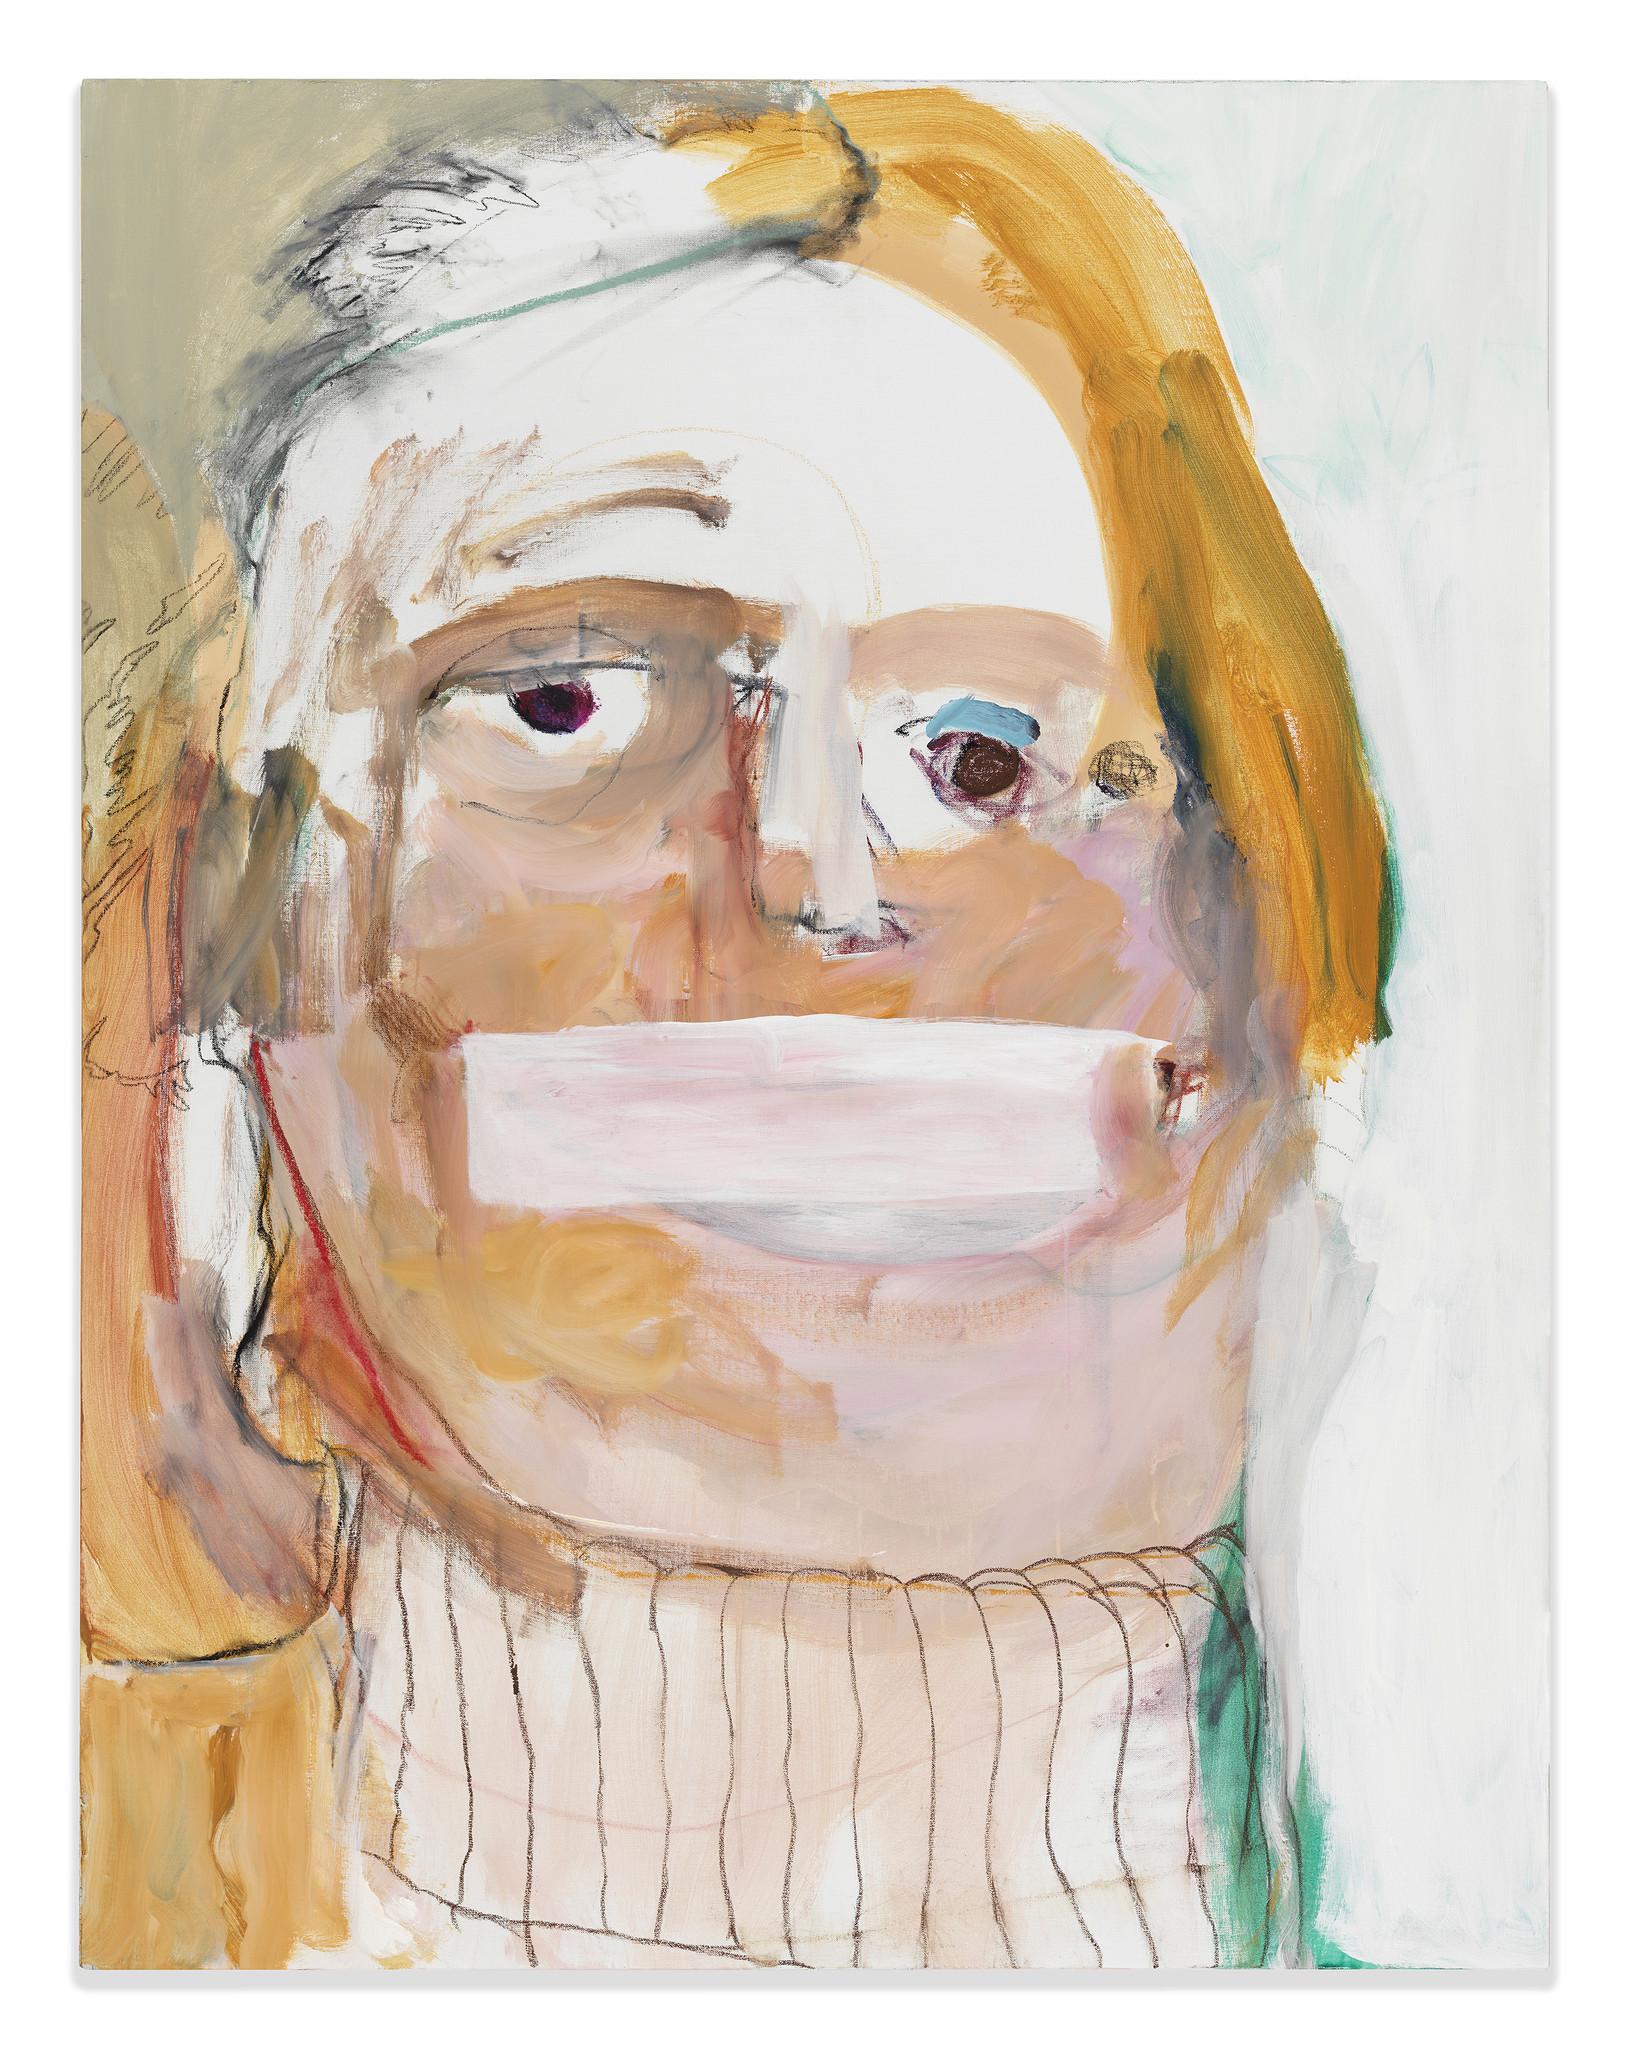 """Hillary,"" by Margot Bergman, at Susanne Vielmetter Los Angeles Projects"